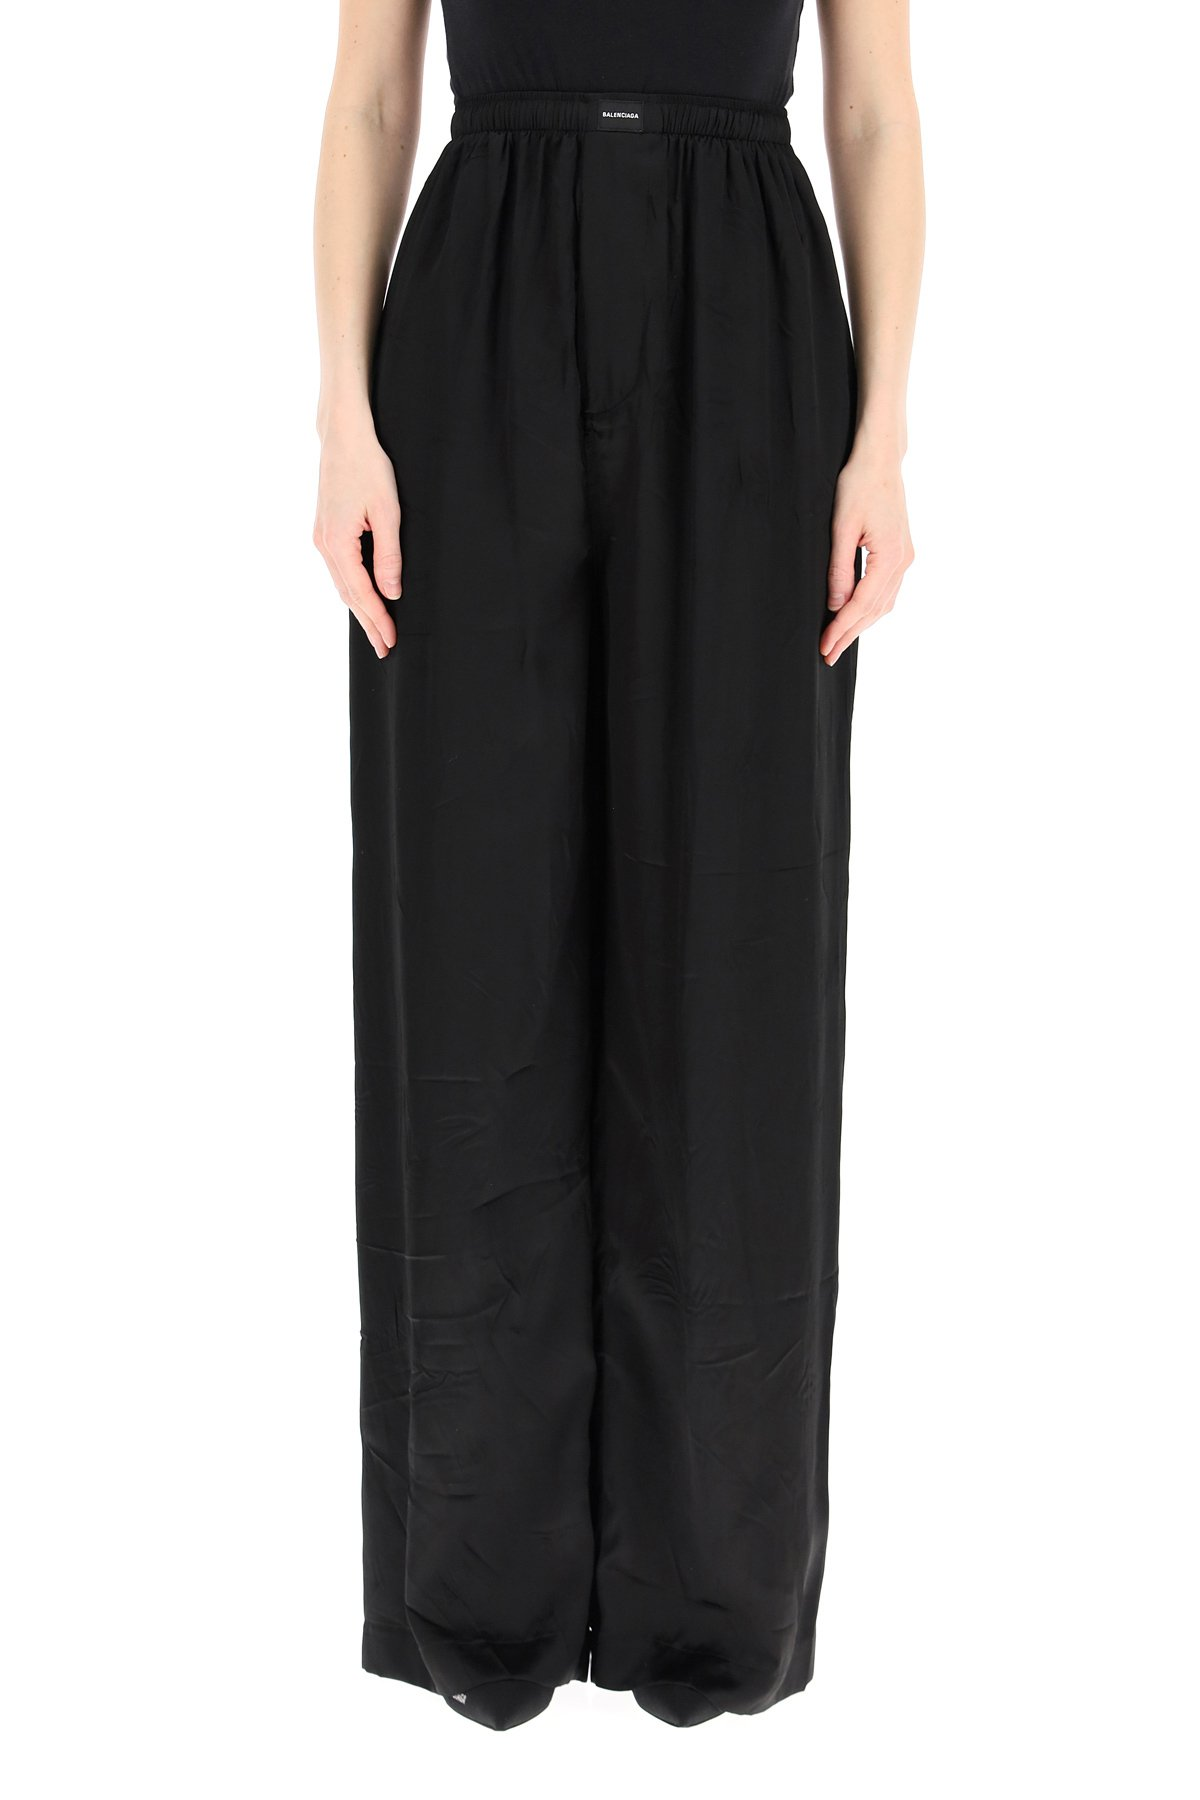 Balenciaga pantaloni pajama in satin